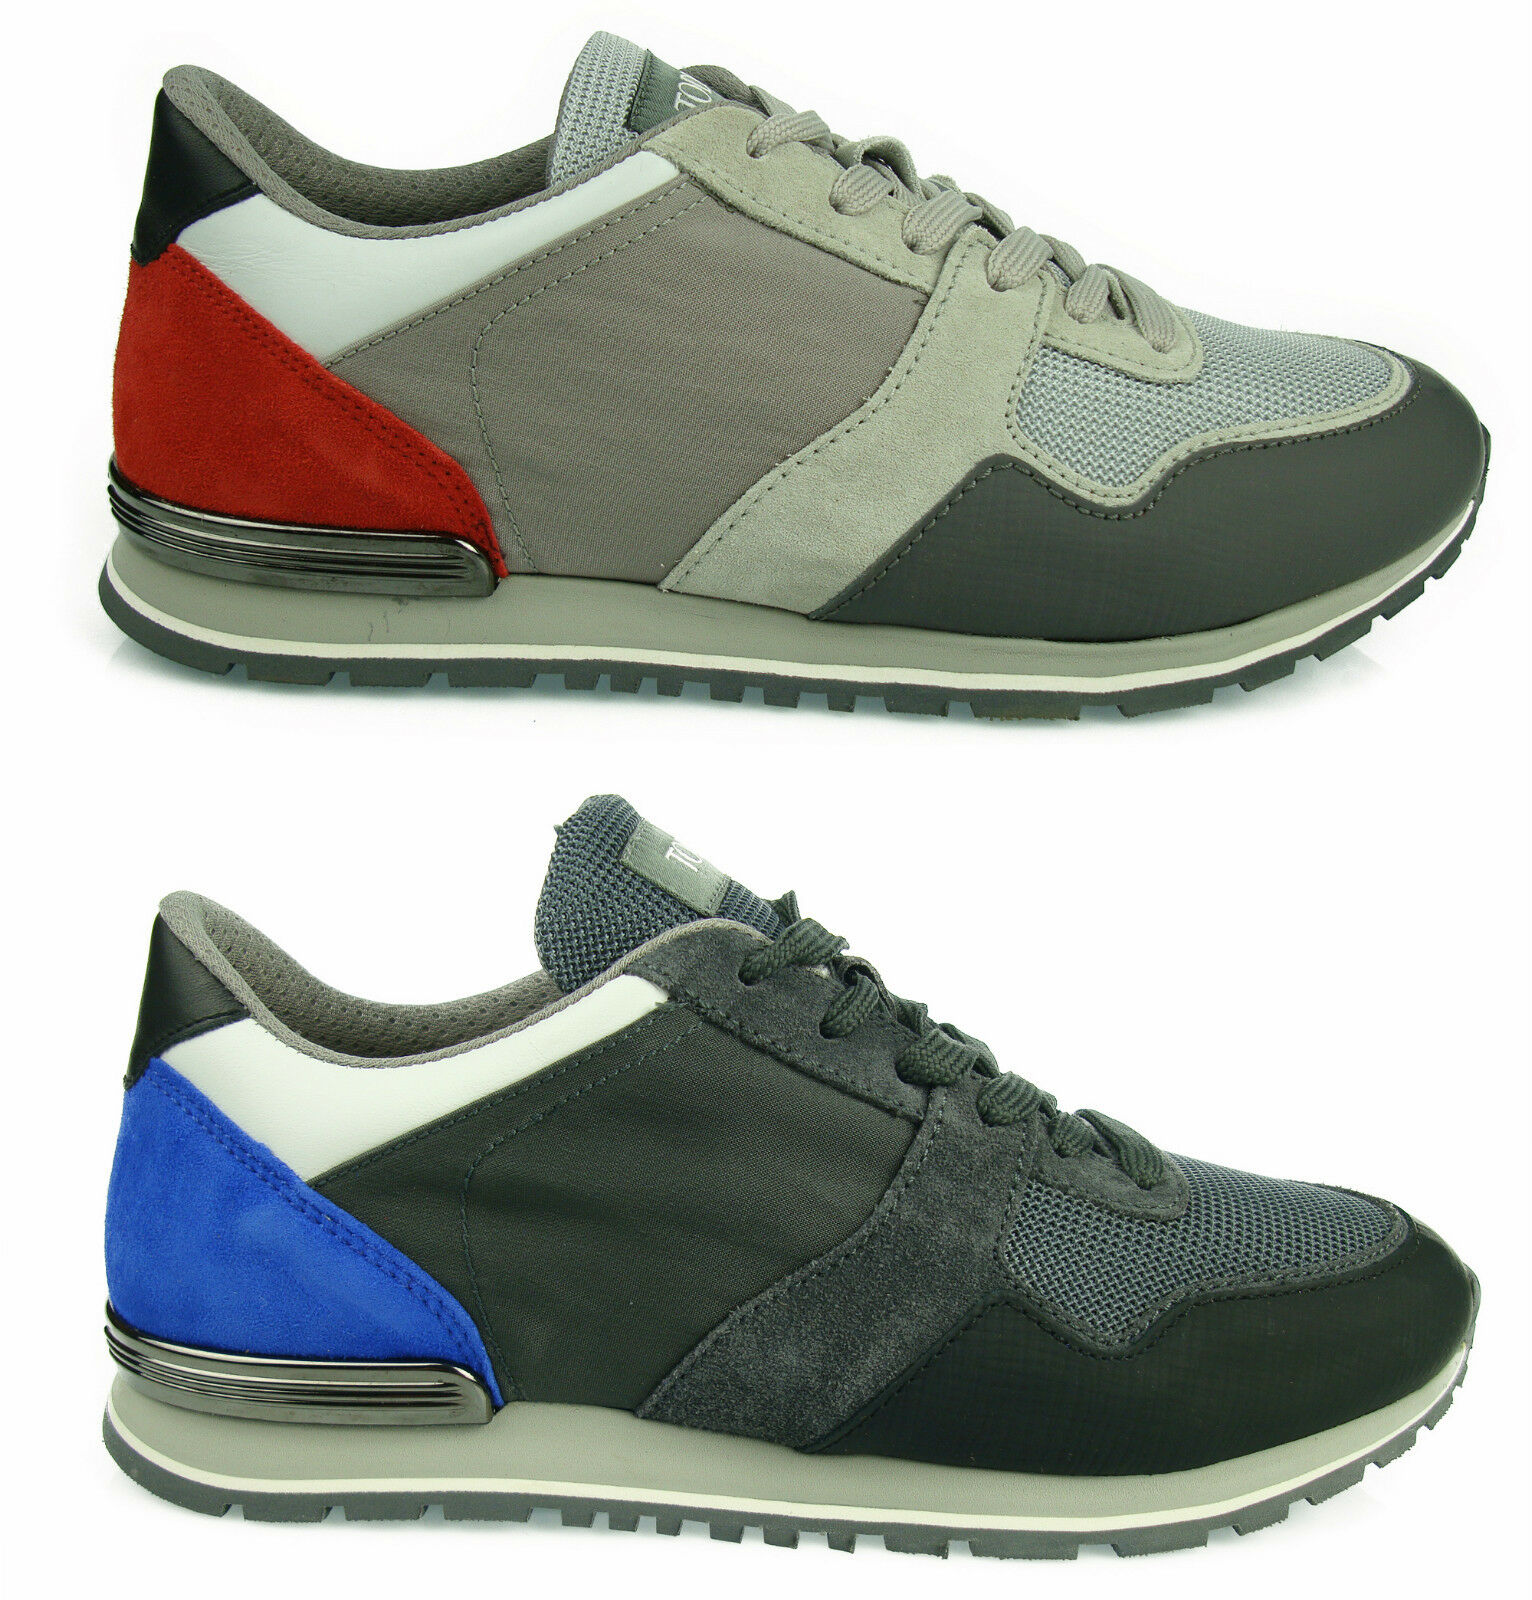 TOD'S Schuhe UOMO SNEAKERS MEN'S Schuhe HERRENSHUHE NUOVE 100% AUT.